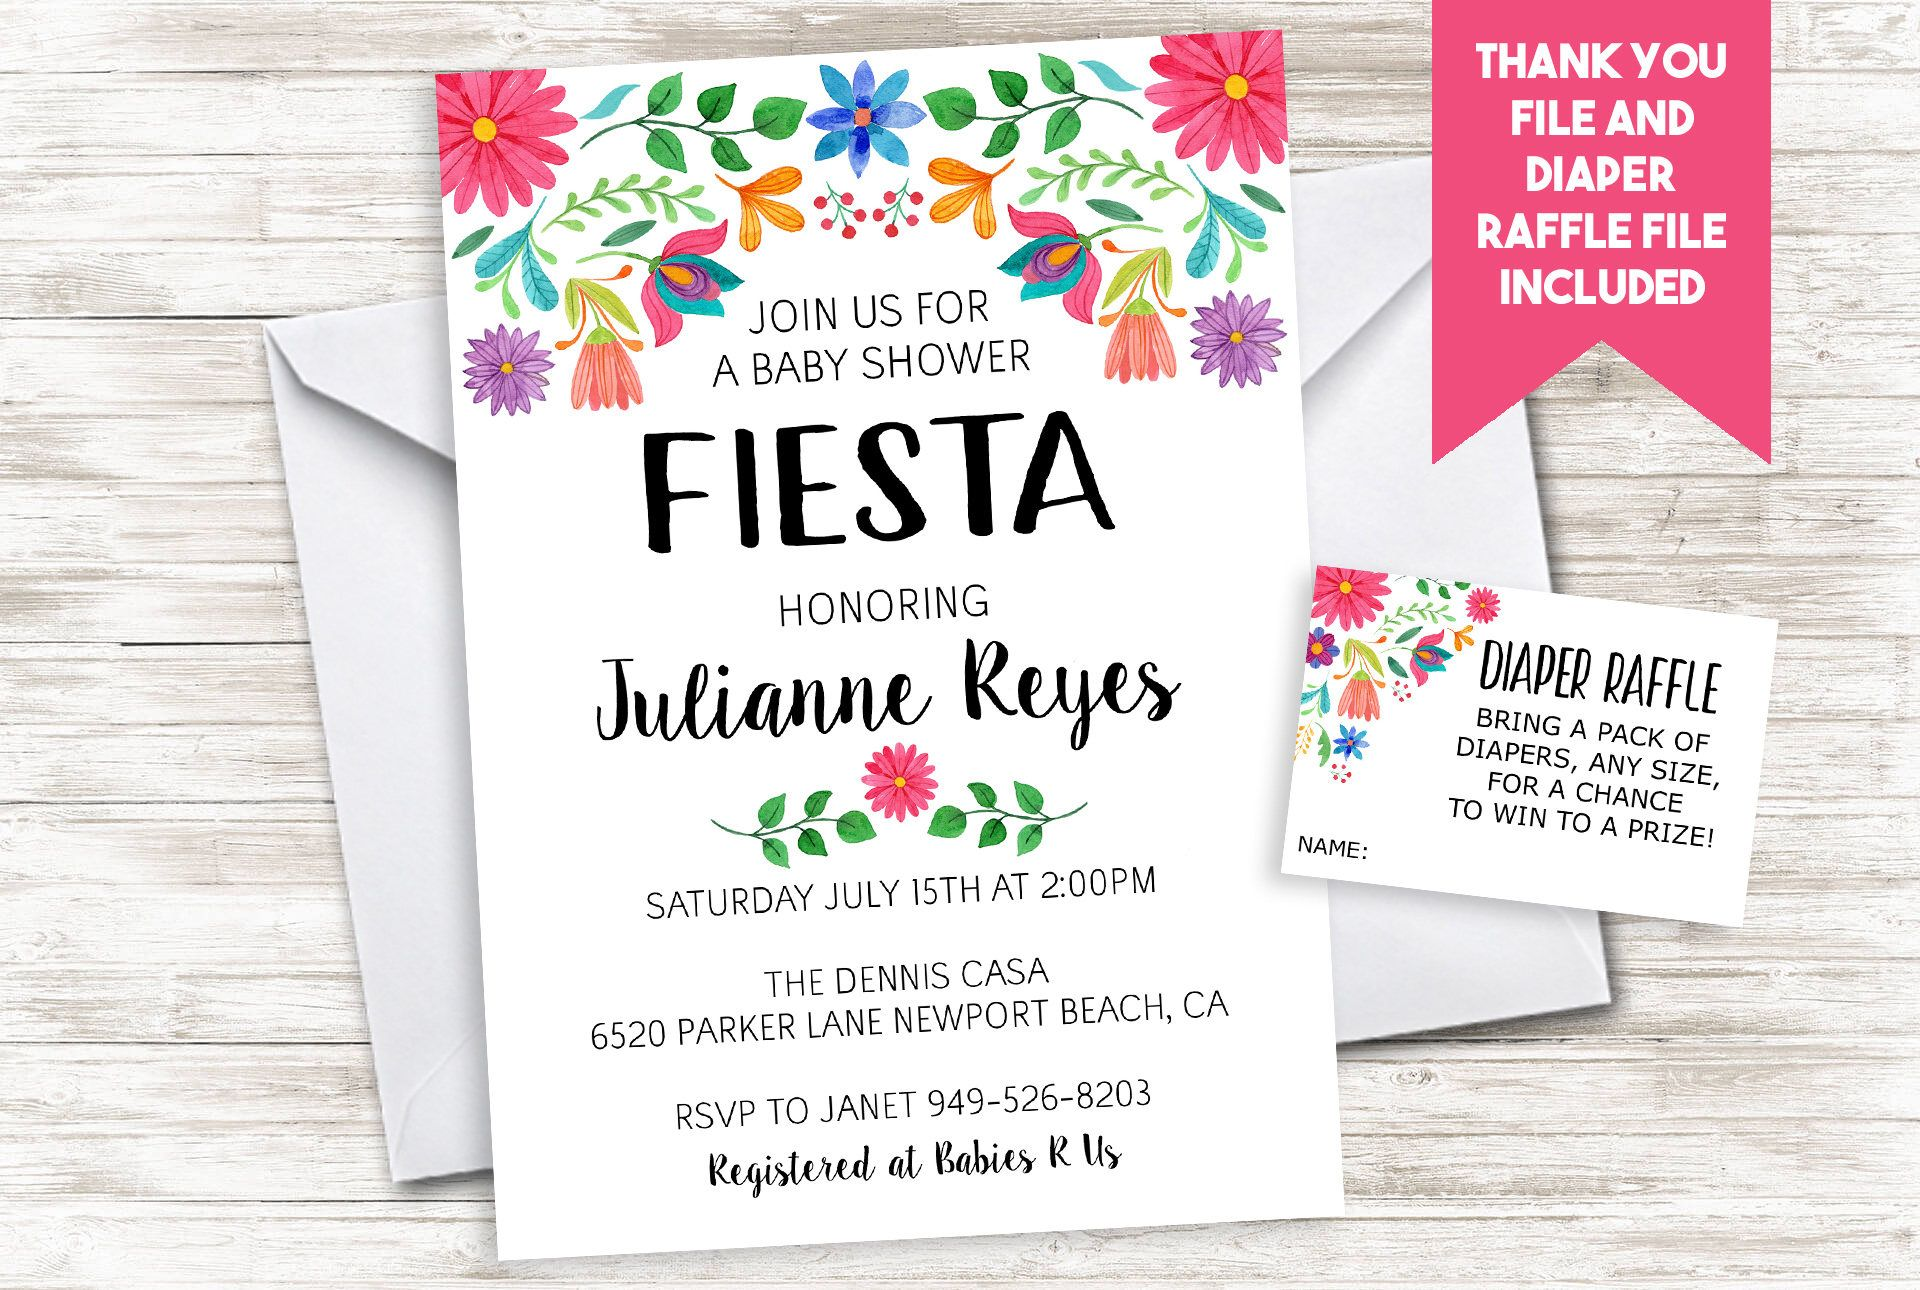 Fiesta Baby Shower Invitation Invite Digital 5x7 Sprinkle Floral ...